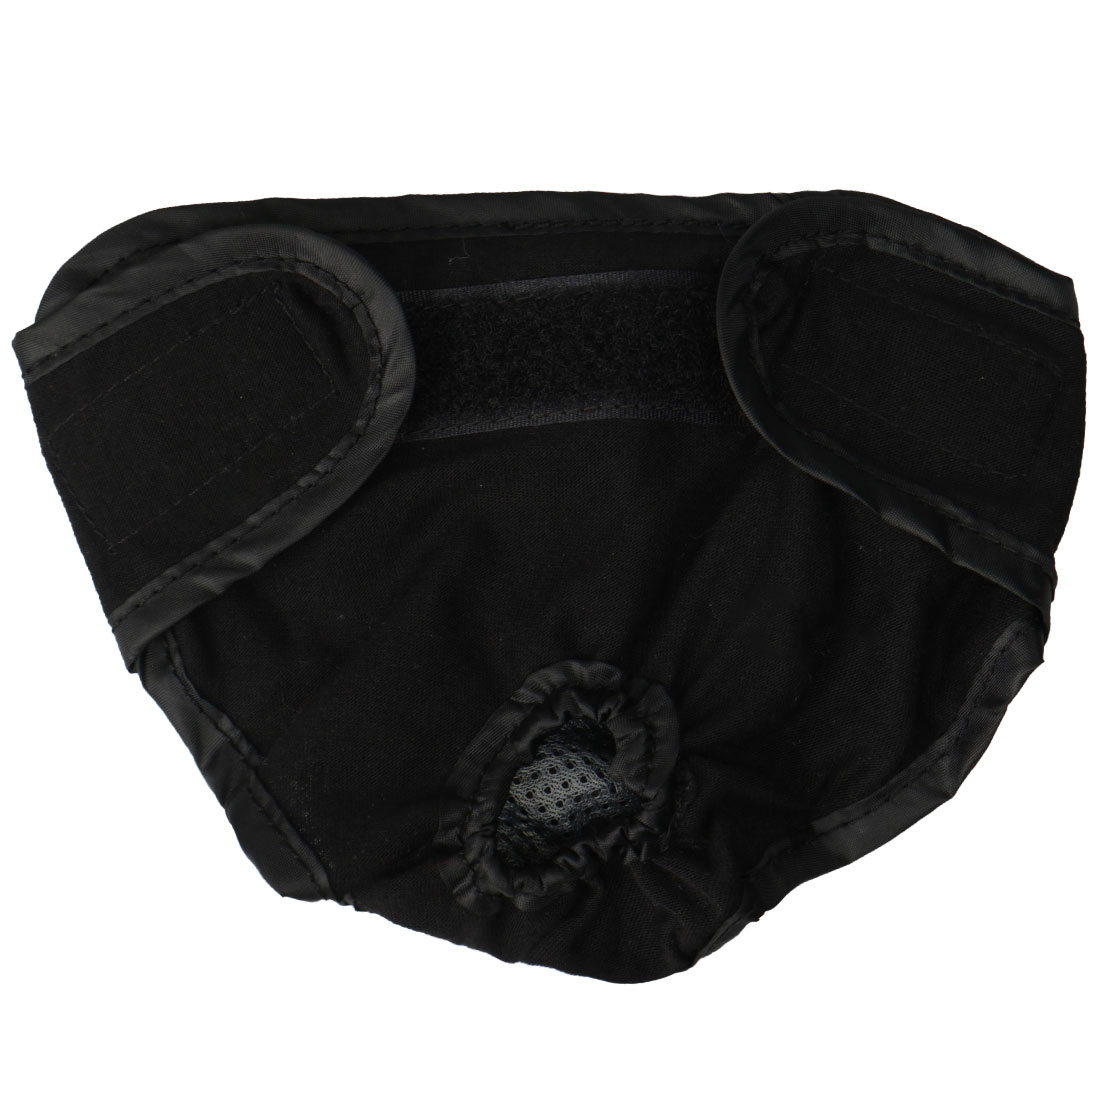 Female Dog Physical Pant Adjustable Leak-resistant Doggie Physical Pant Black L